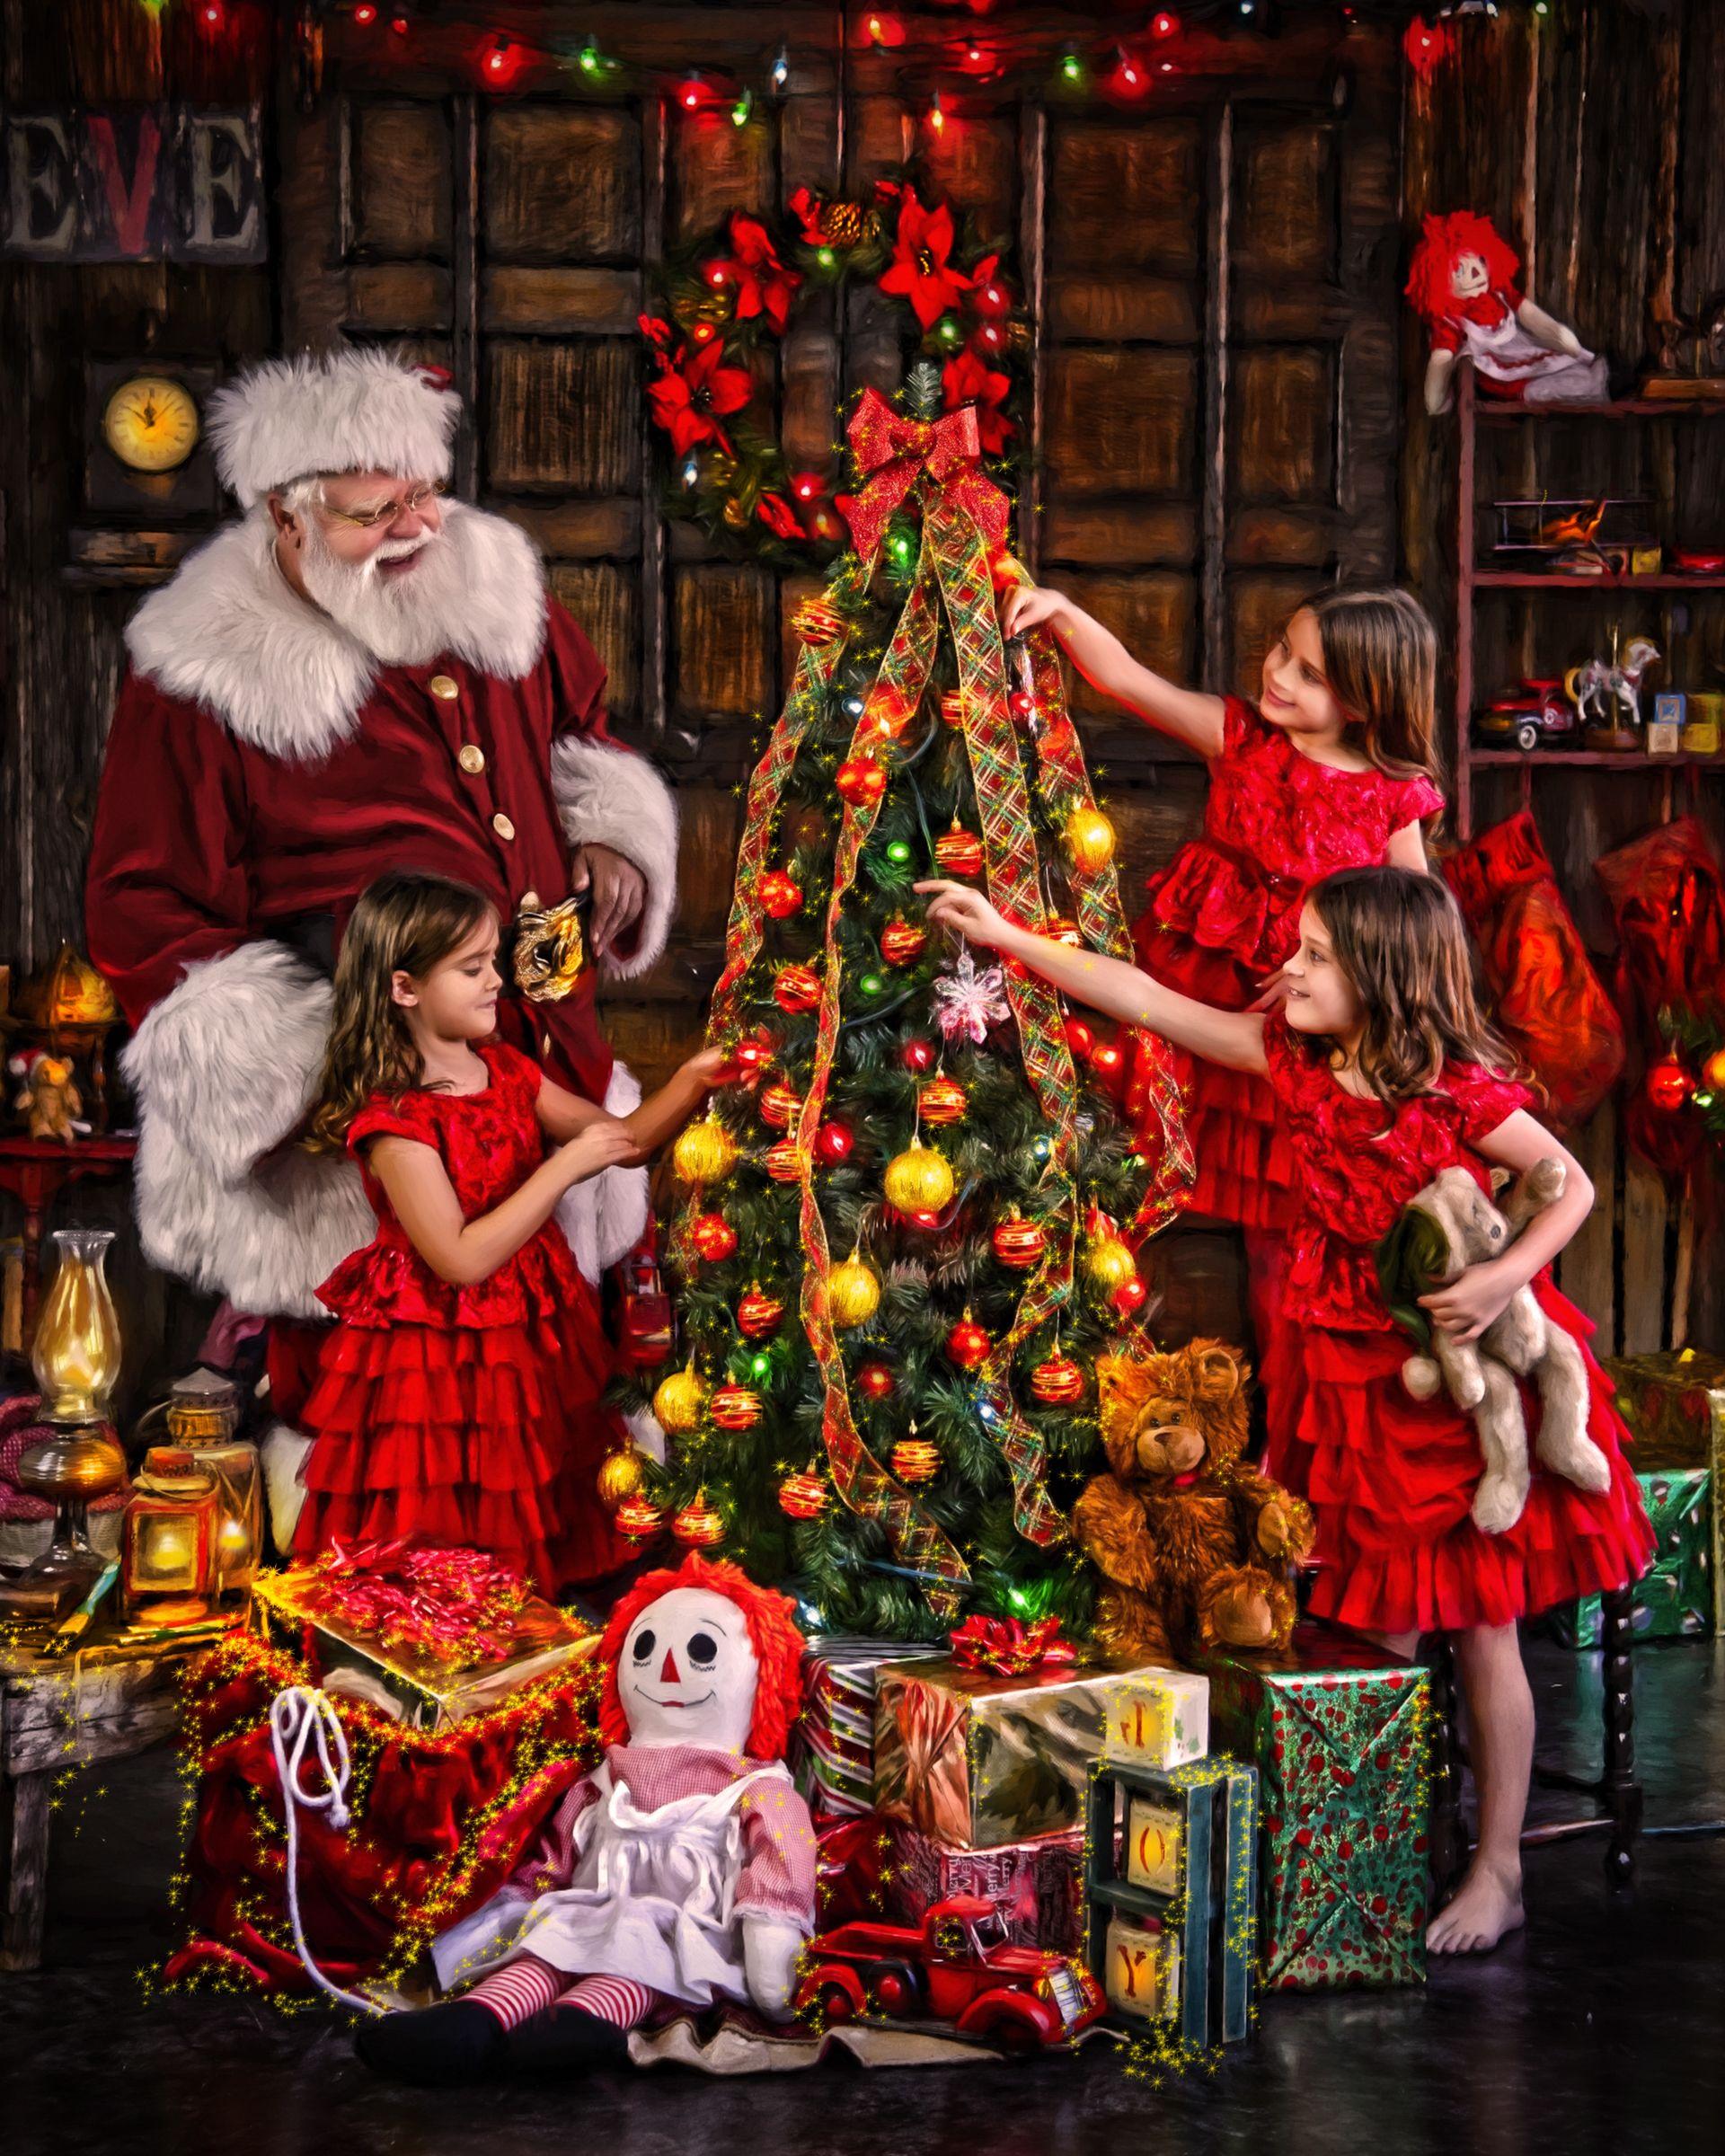 Best Holiday Decor Stores Near Dallas Fort Worth: Pin On Fine Art Santa Portraits At Santa's Workshop